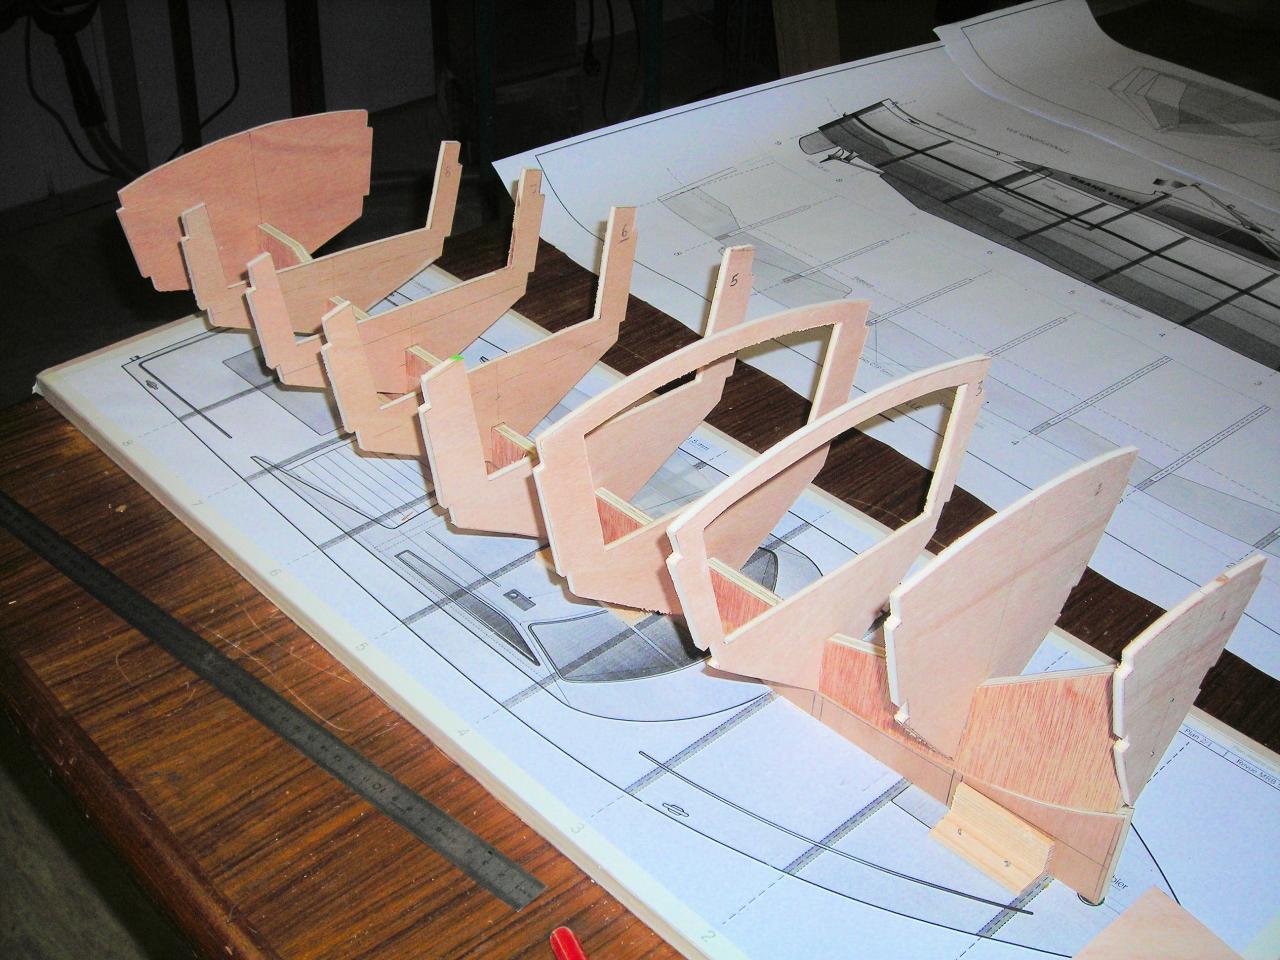 maquettes2.jpg